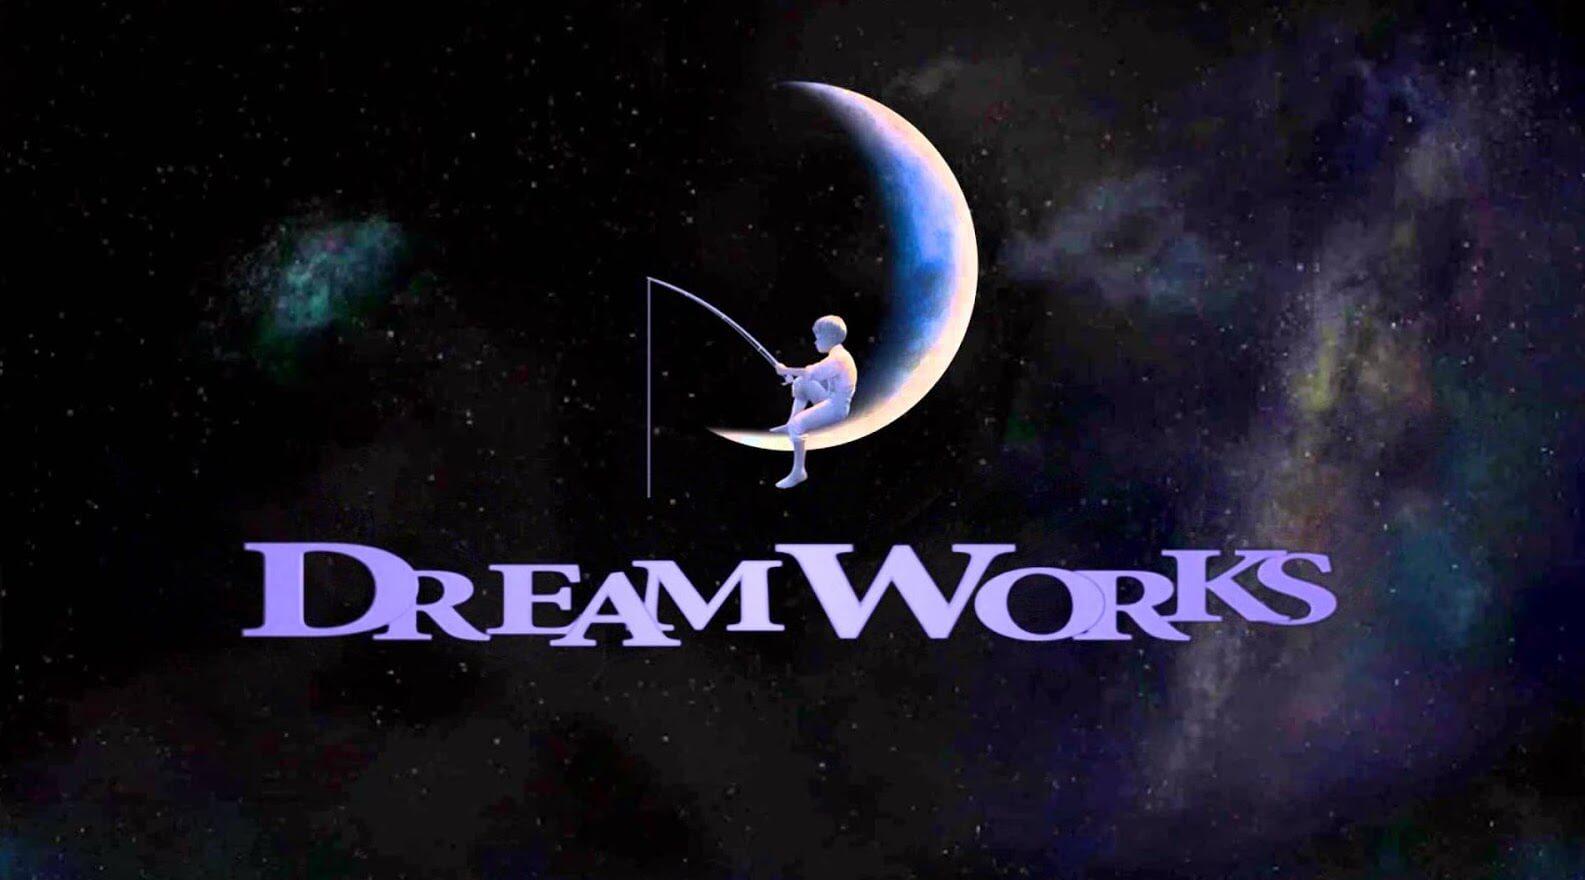 Dreamworks Image